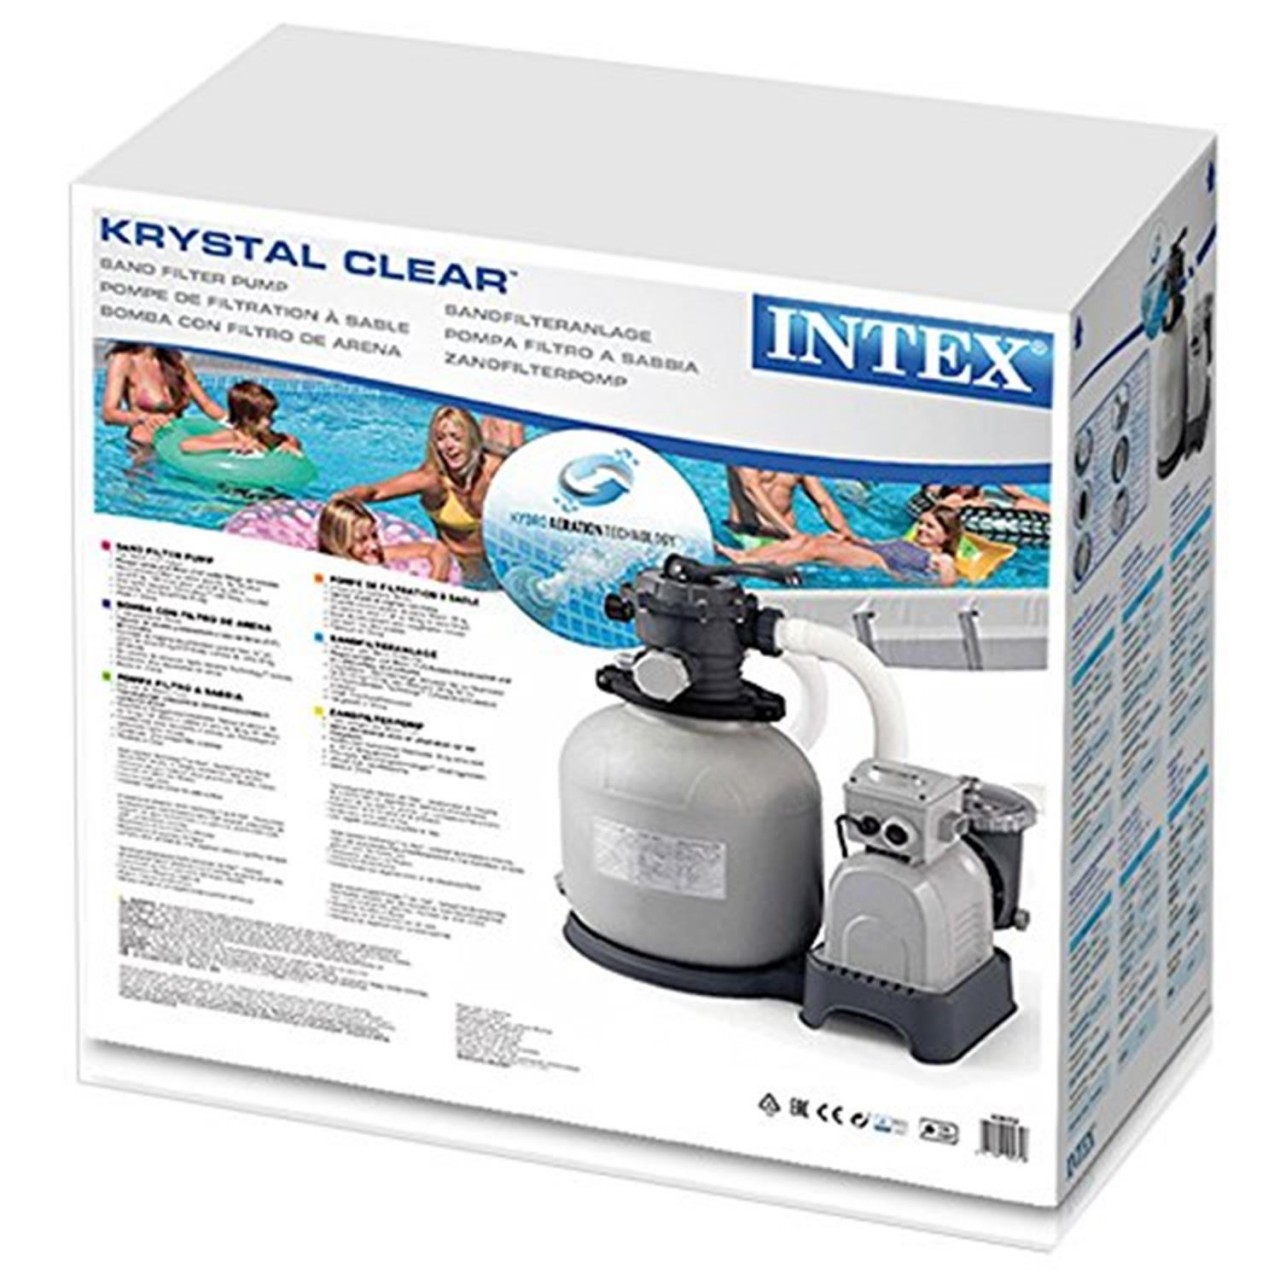 Intex 28652 Sandfilteranlage 12m³ Pool Pumpe Filterpumpe Krystal Clear